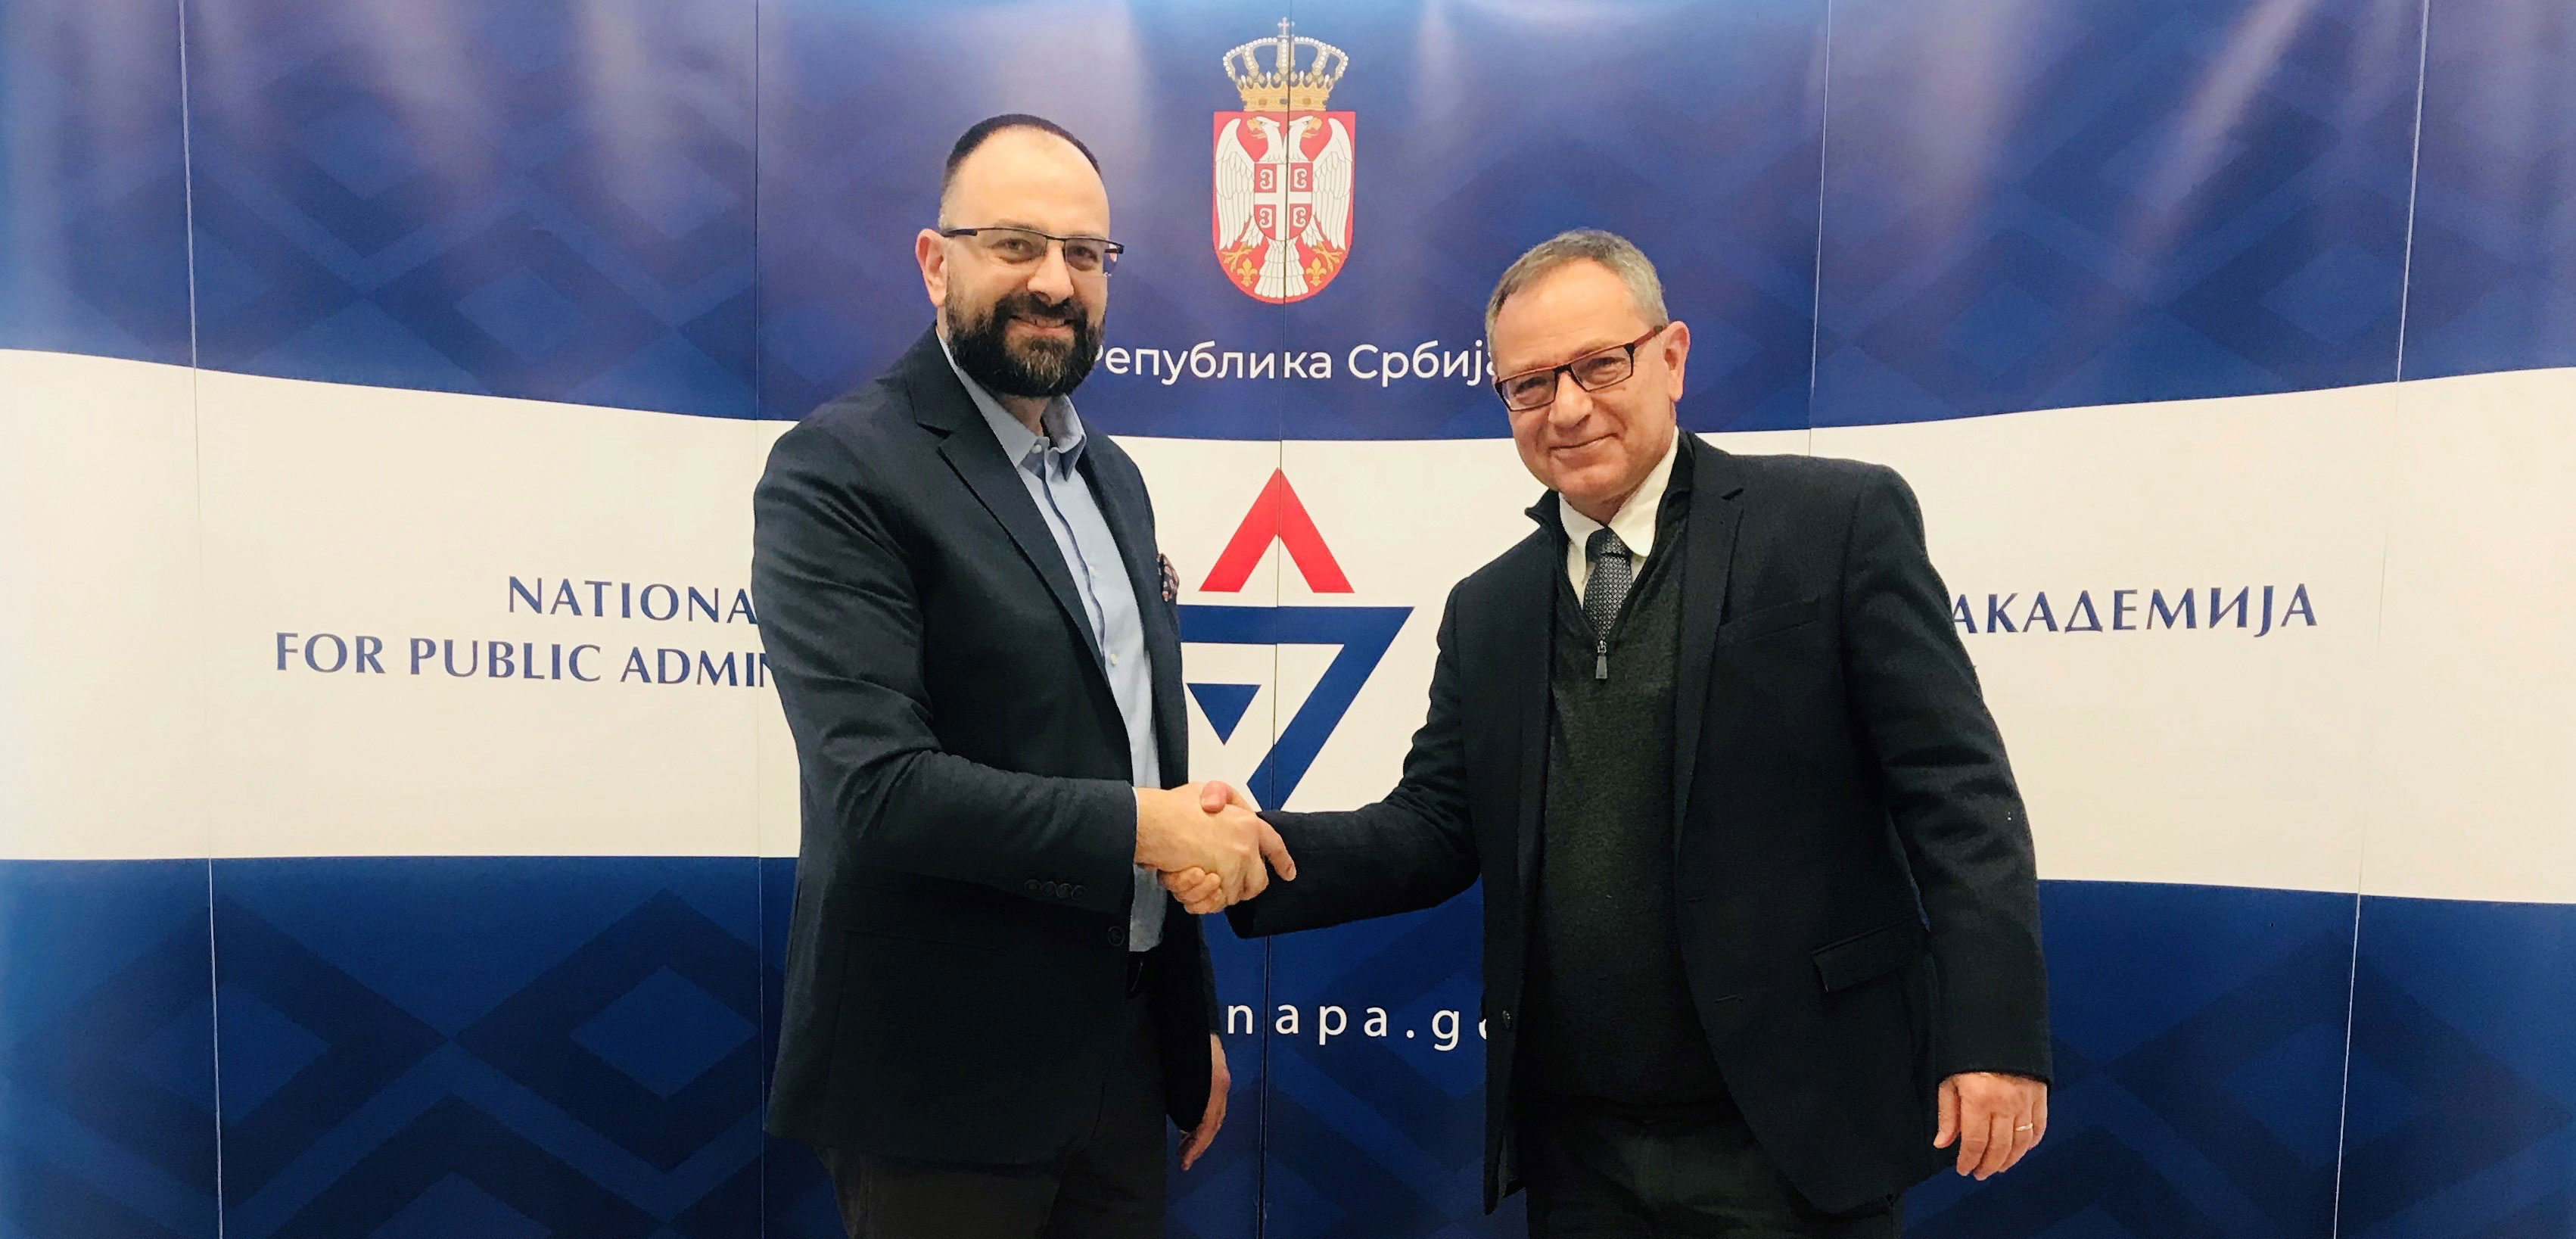 EIPA strengthens ties with Serbia: Signing of new Memorandum of Understanding